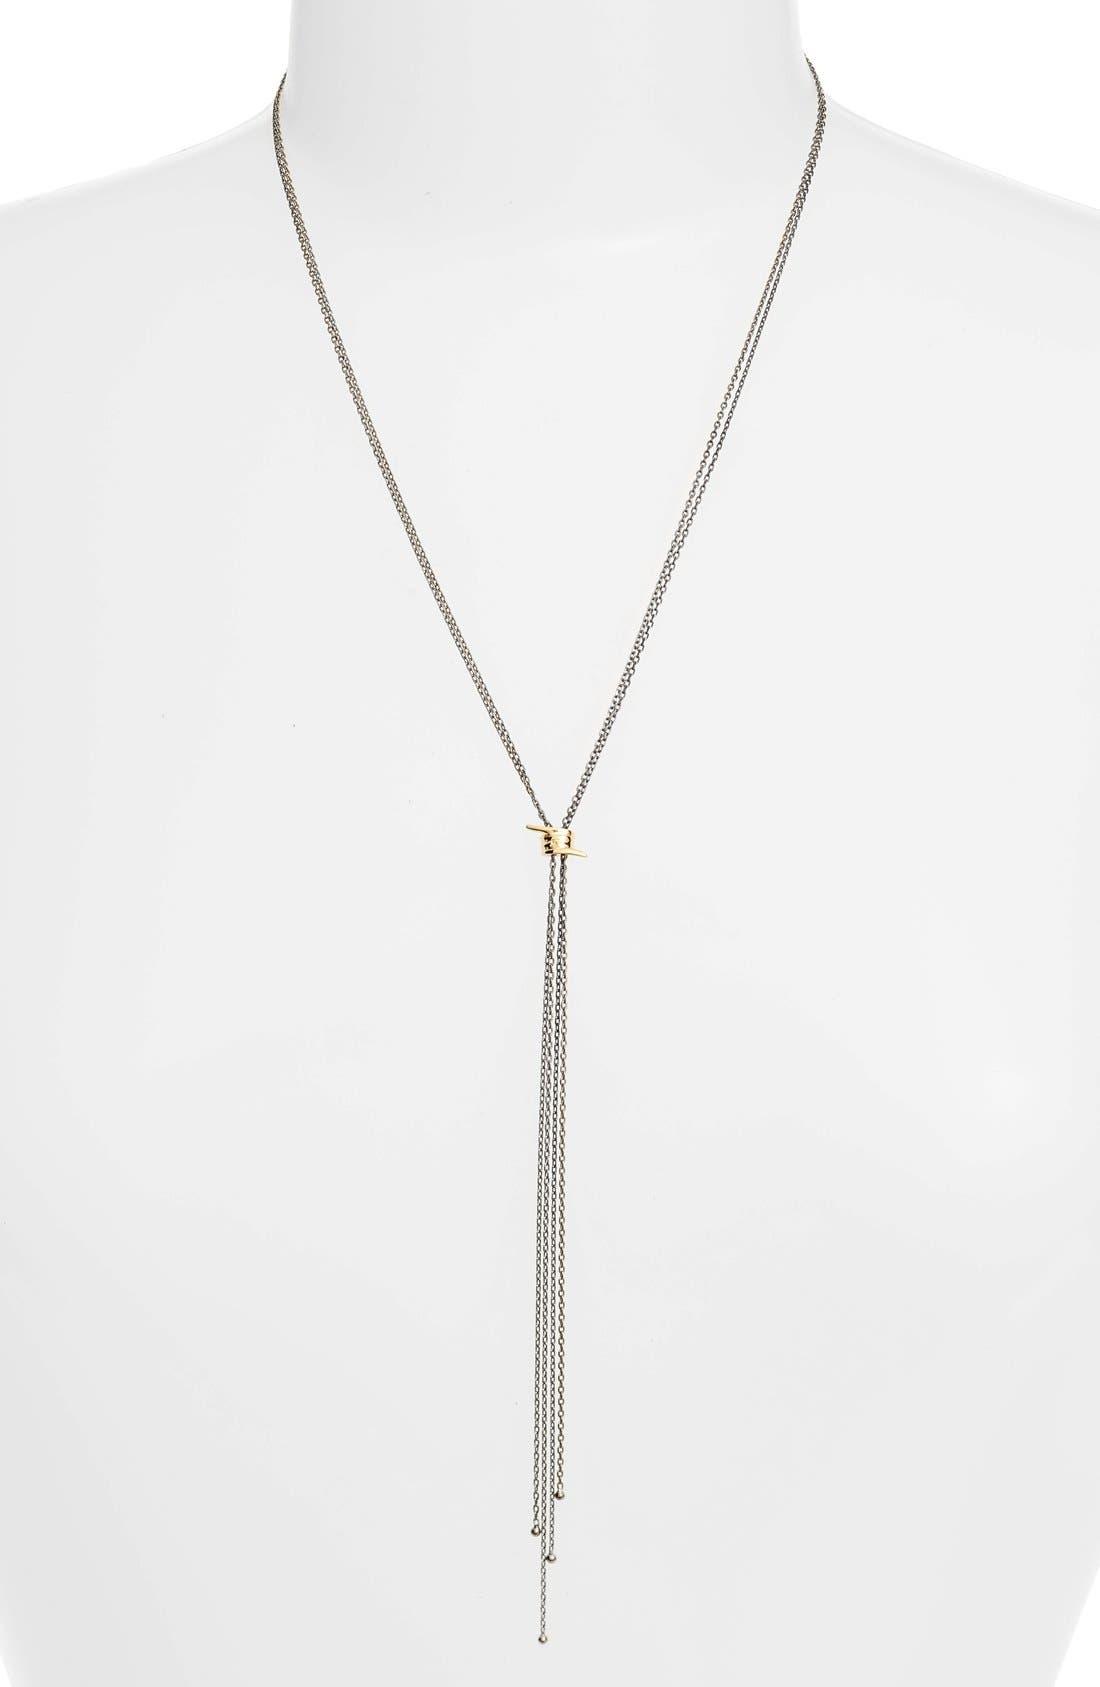 Topanga Lariat Necklace,                             Main thumbnail 1, color,                             Gunmetal/ Gold